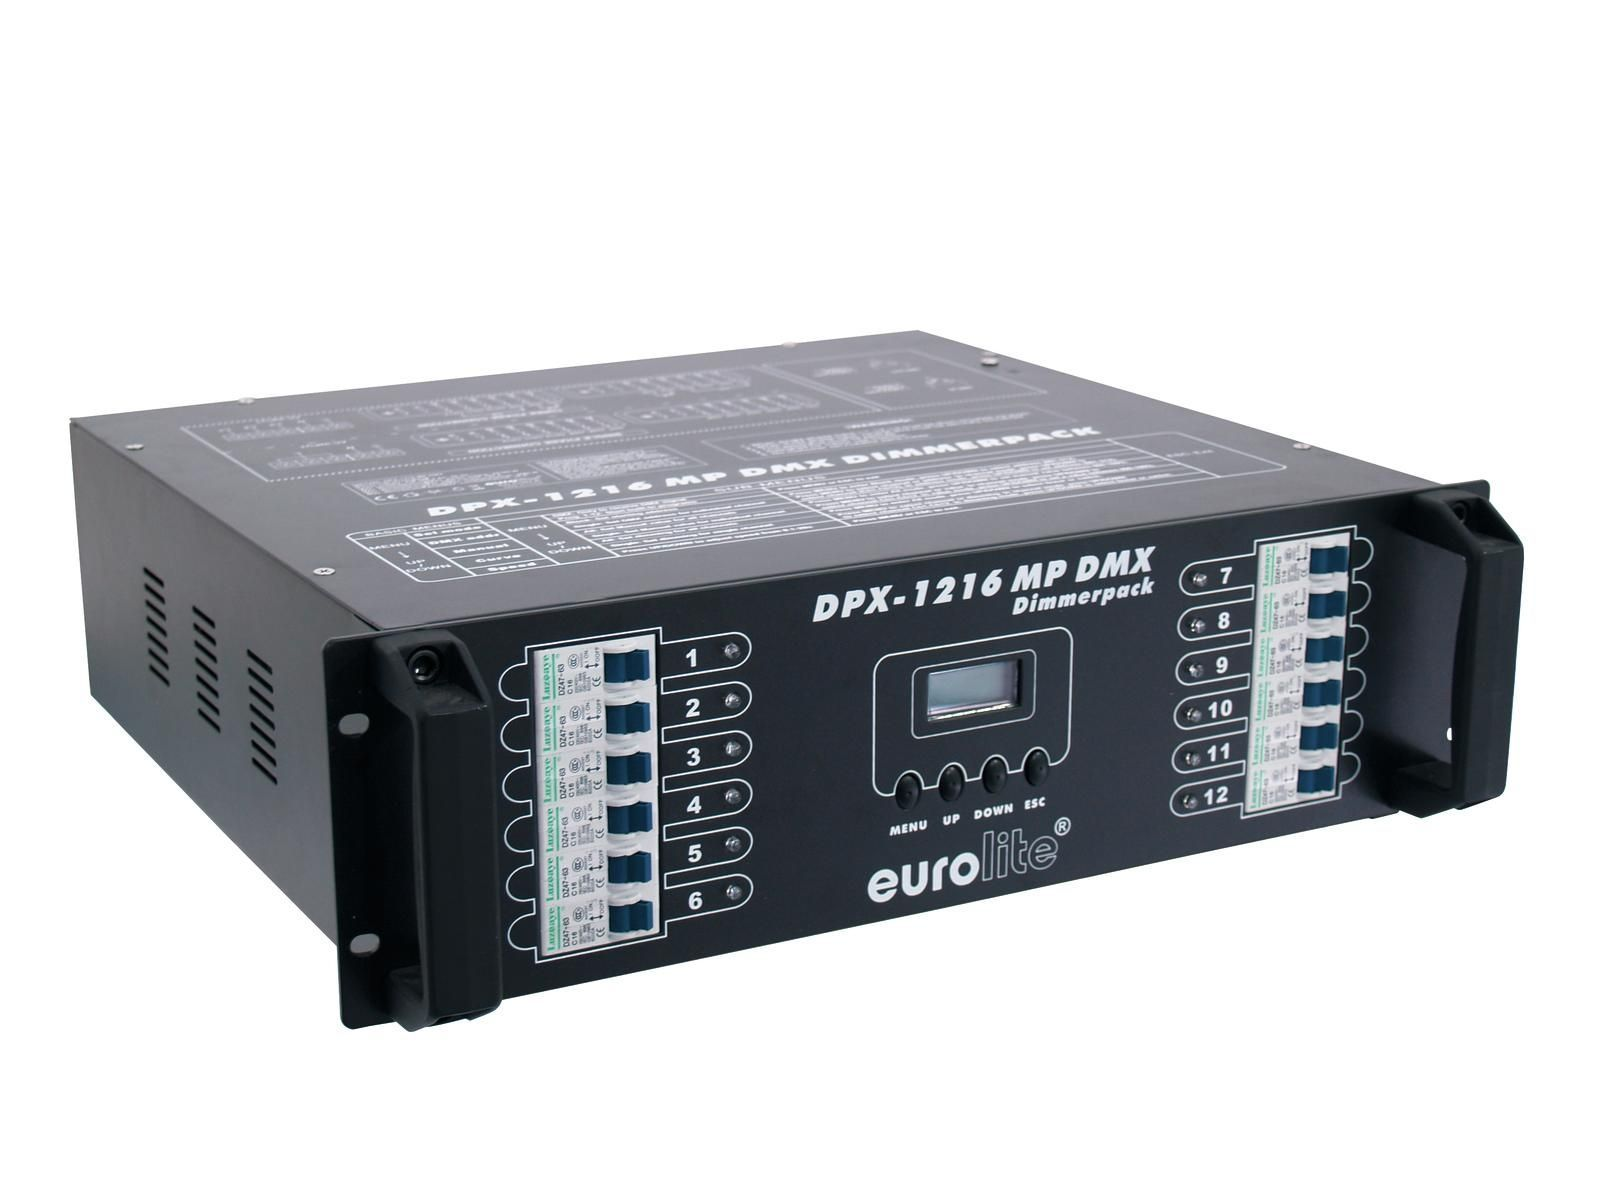 EUROLITE DPX 1216 MP DMX Dimmerpack